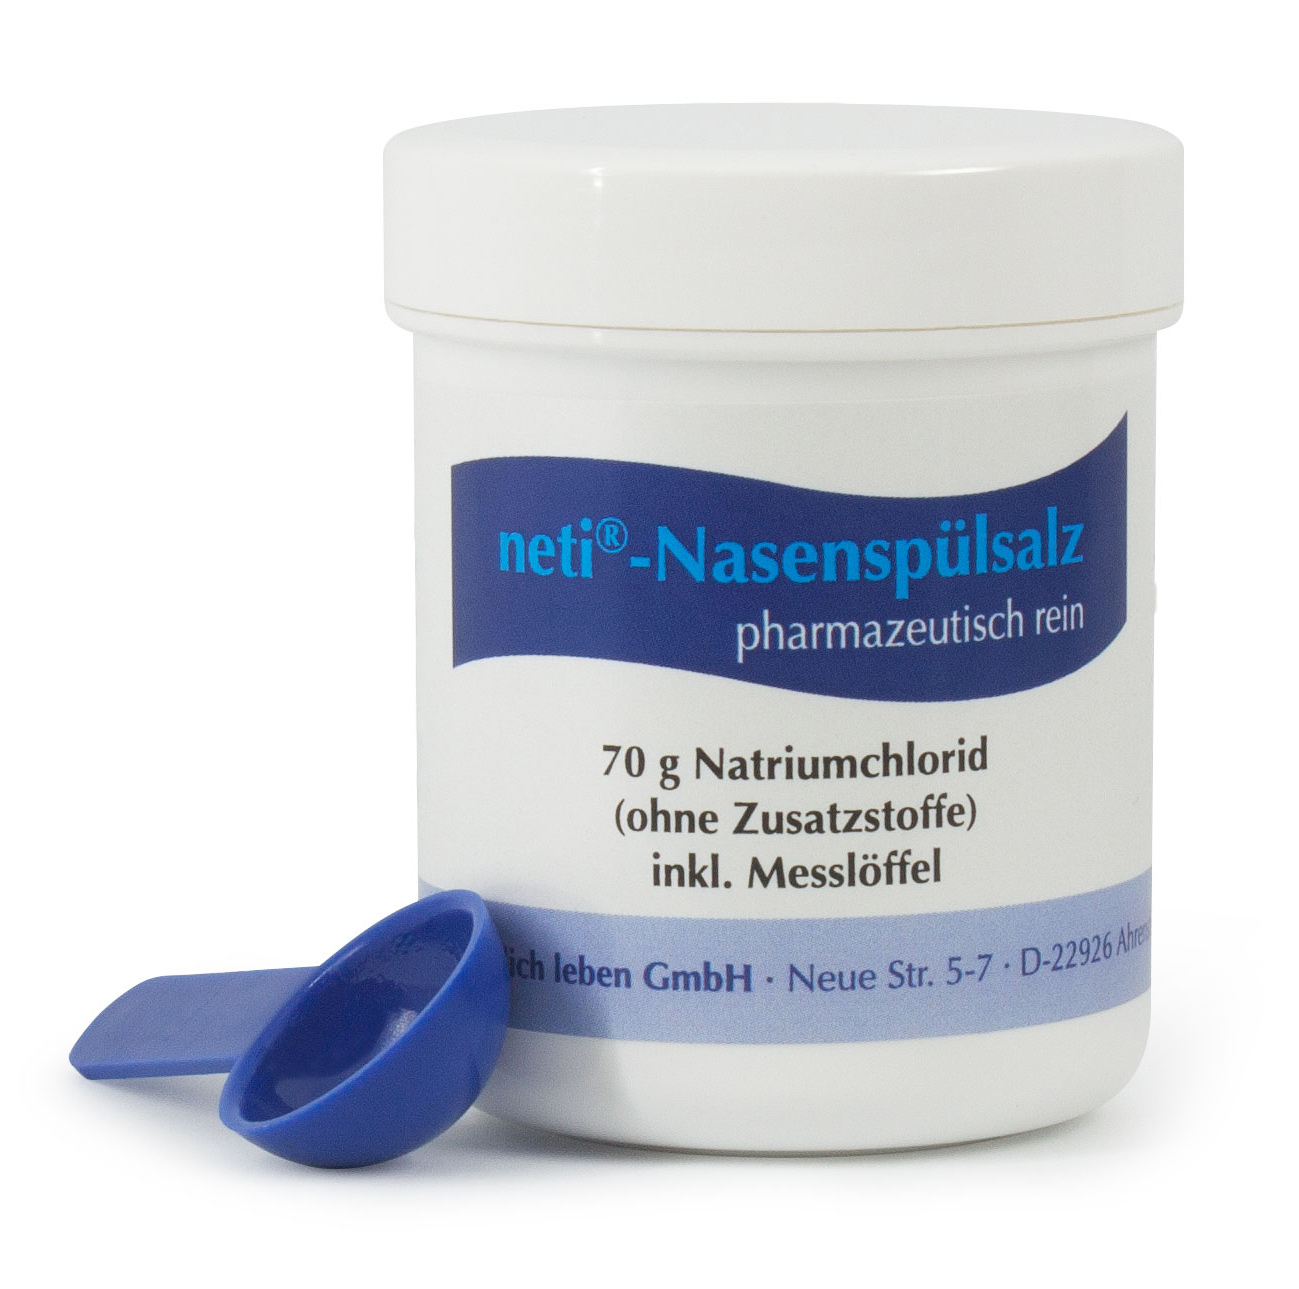 neti® Nasenspülsalzdose mit Messlöffel, 70 g